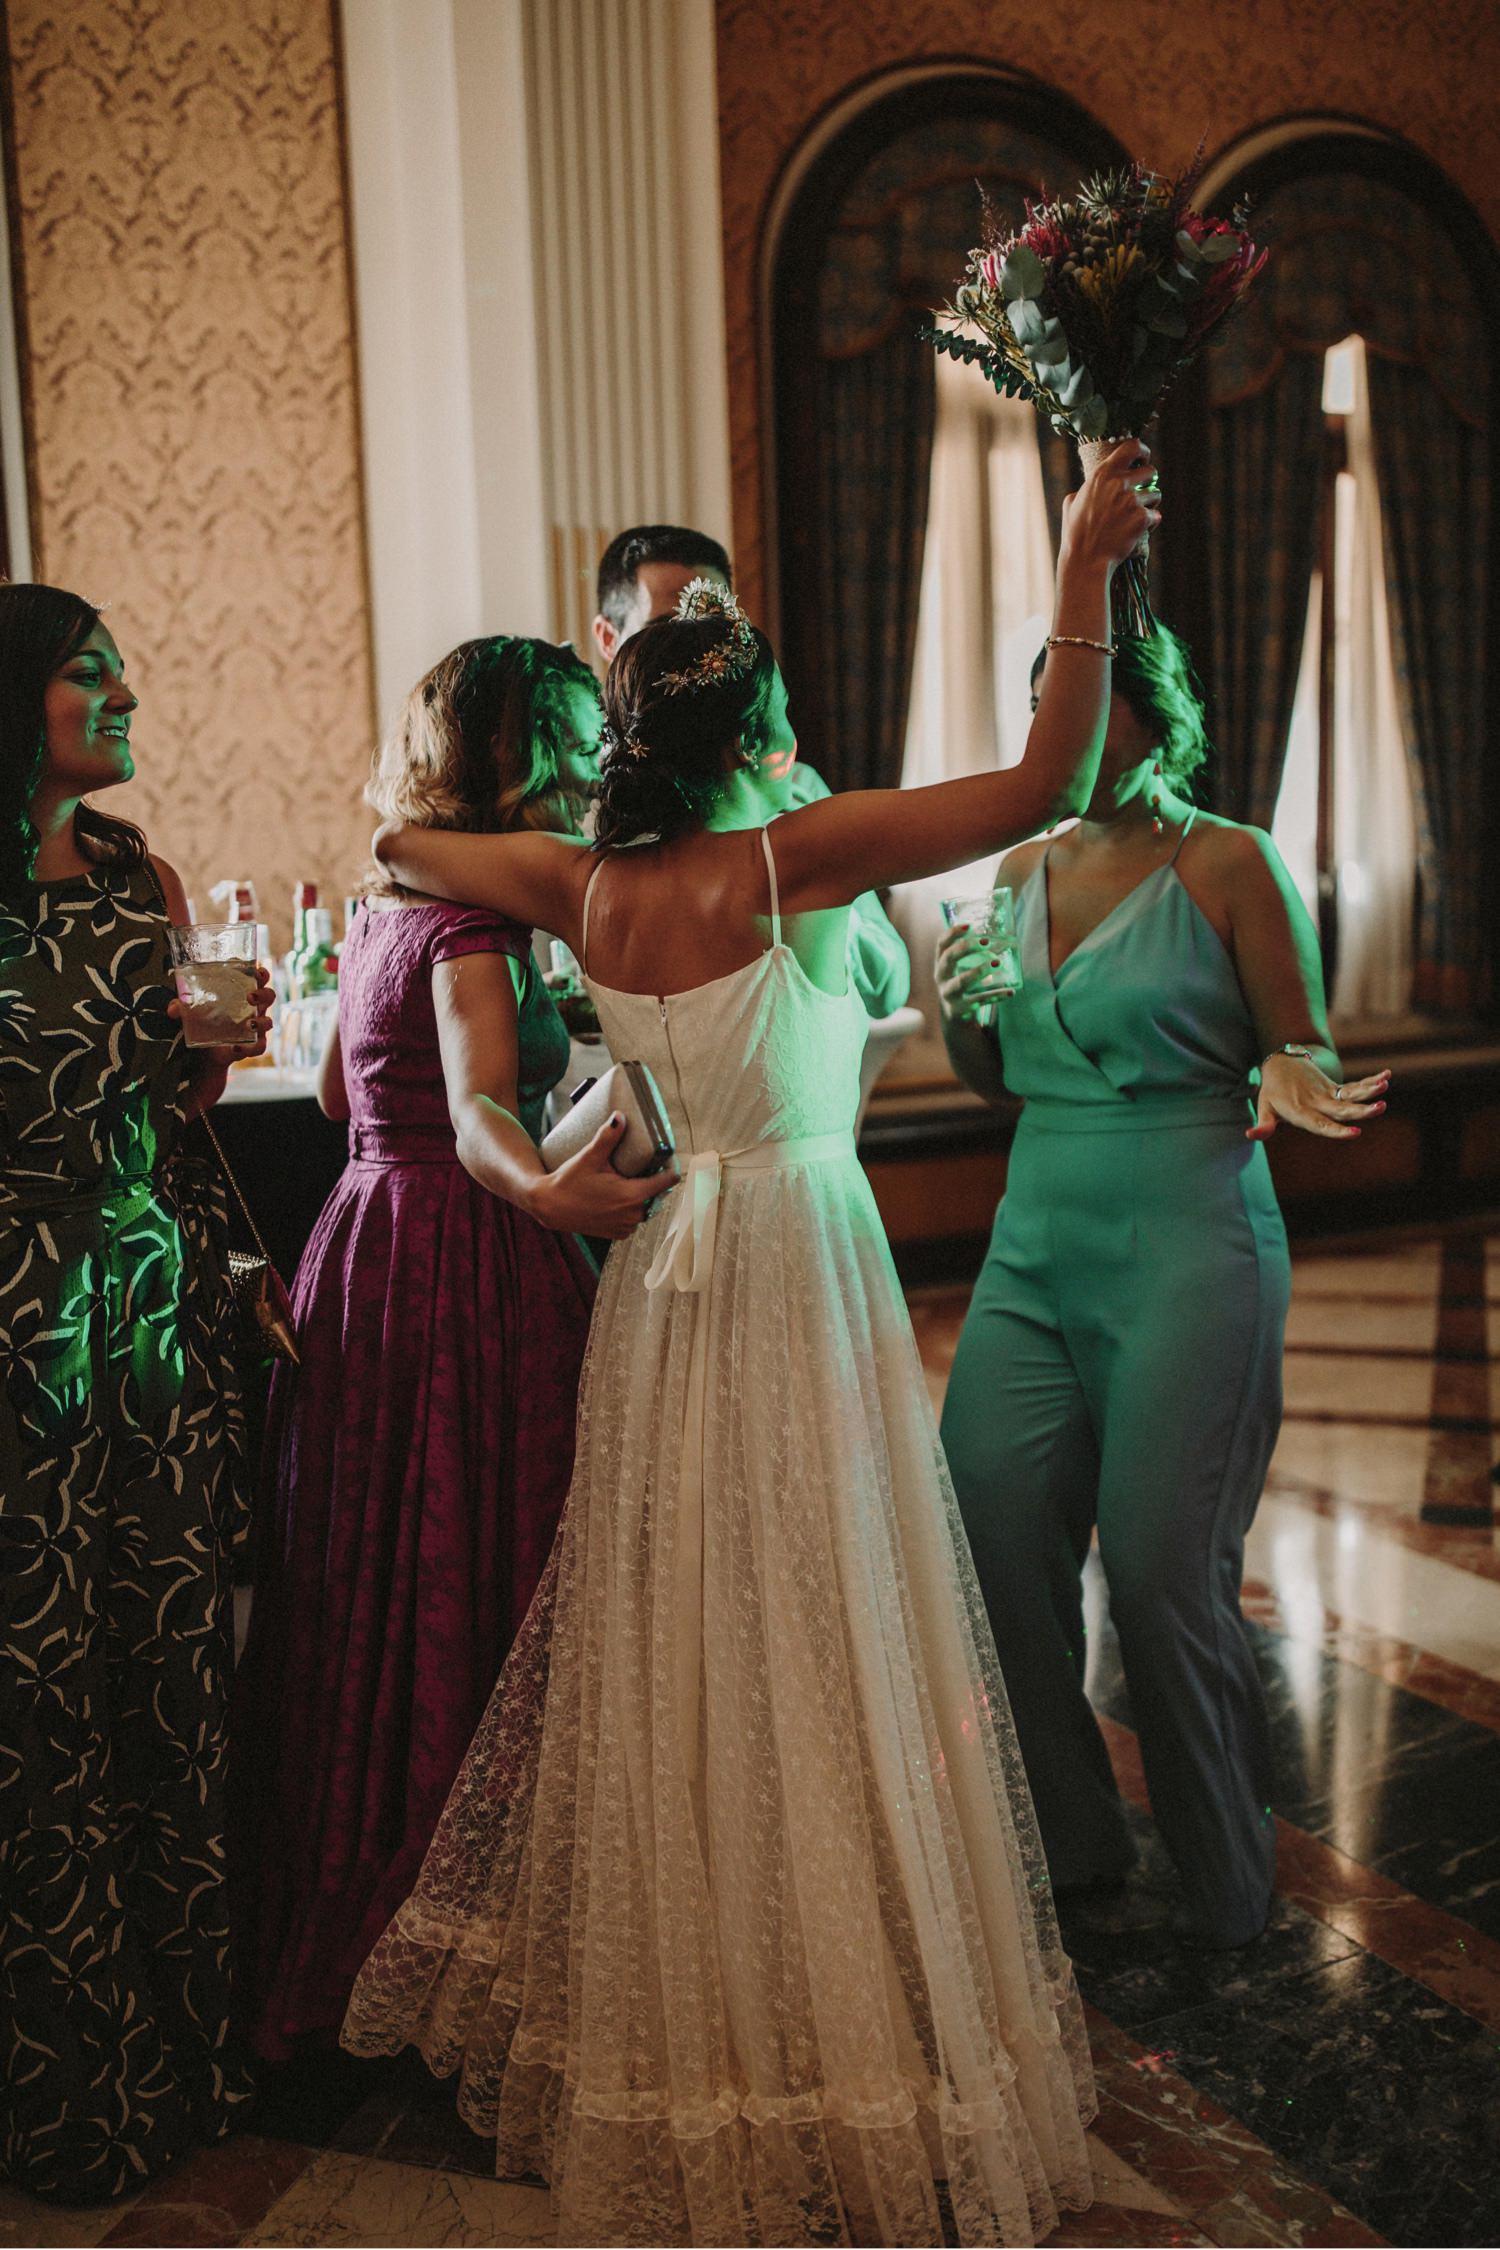 106_wedding-ernestovillalba-maria-daniel-6713-ASE.jpg